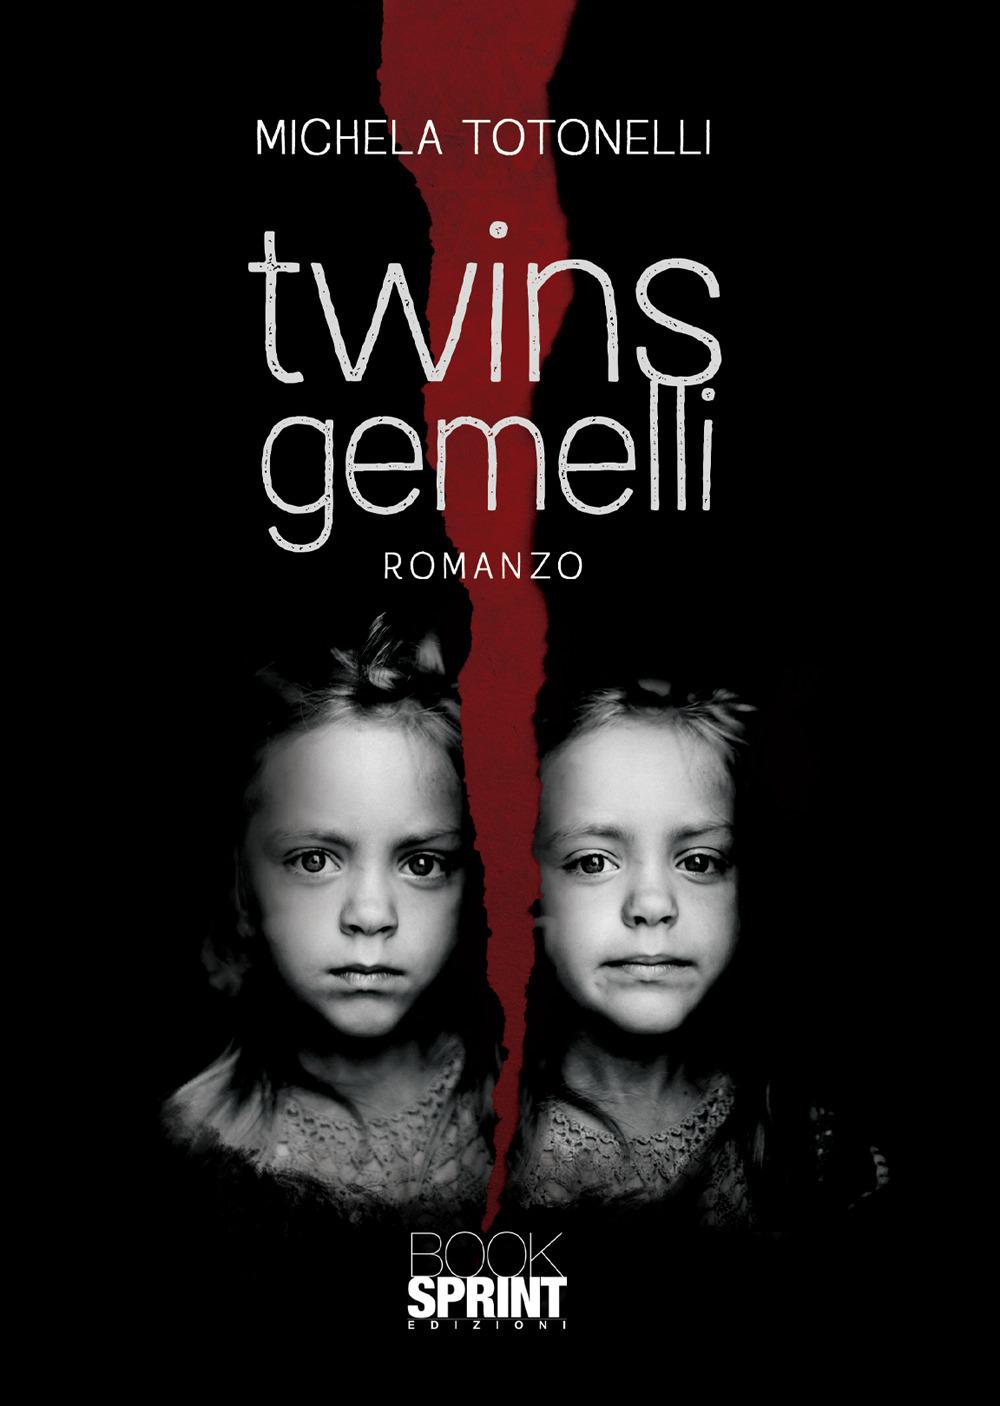 Image of Twins gemelli